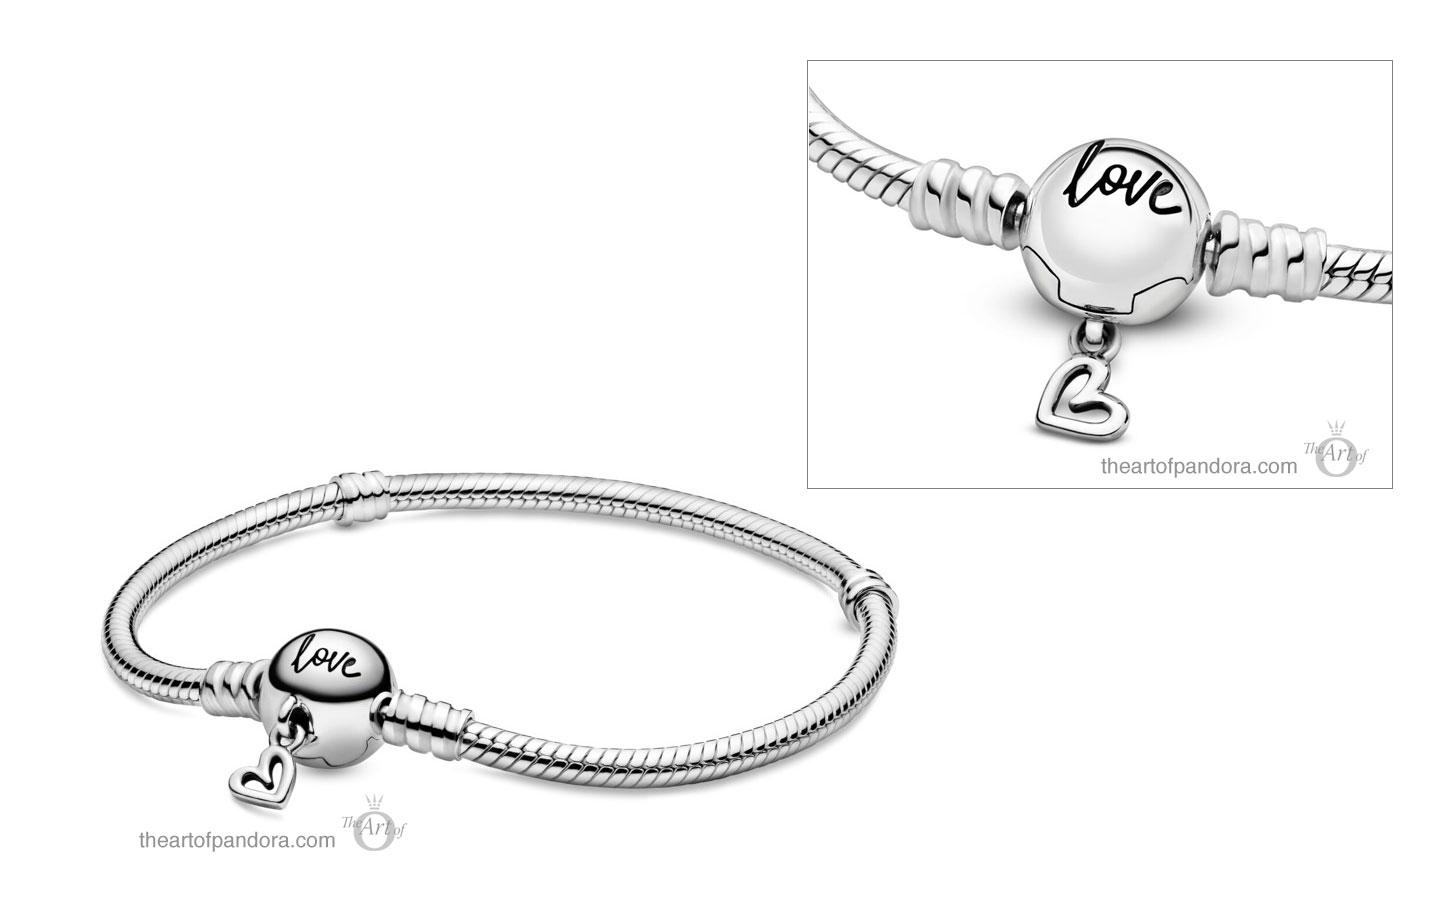 pandora moments heart clasp snake chain bracelet rose gold